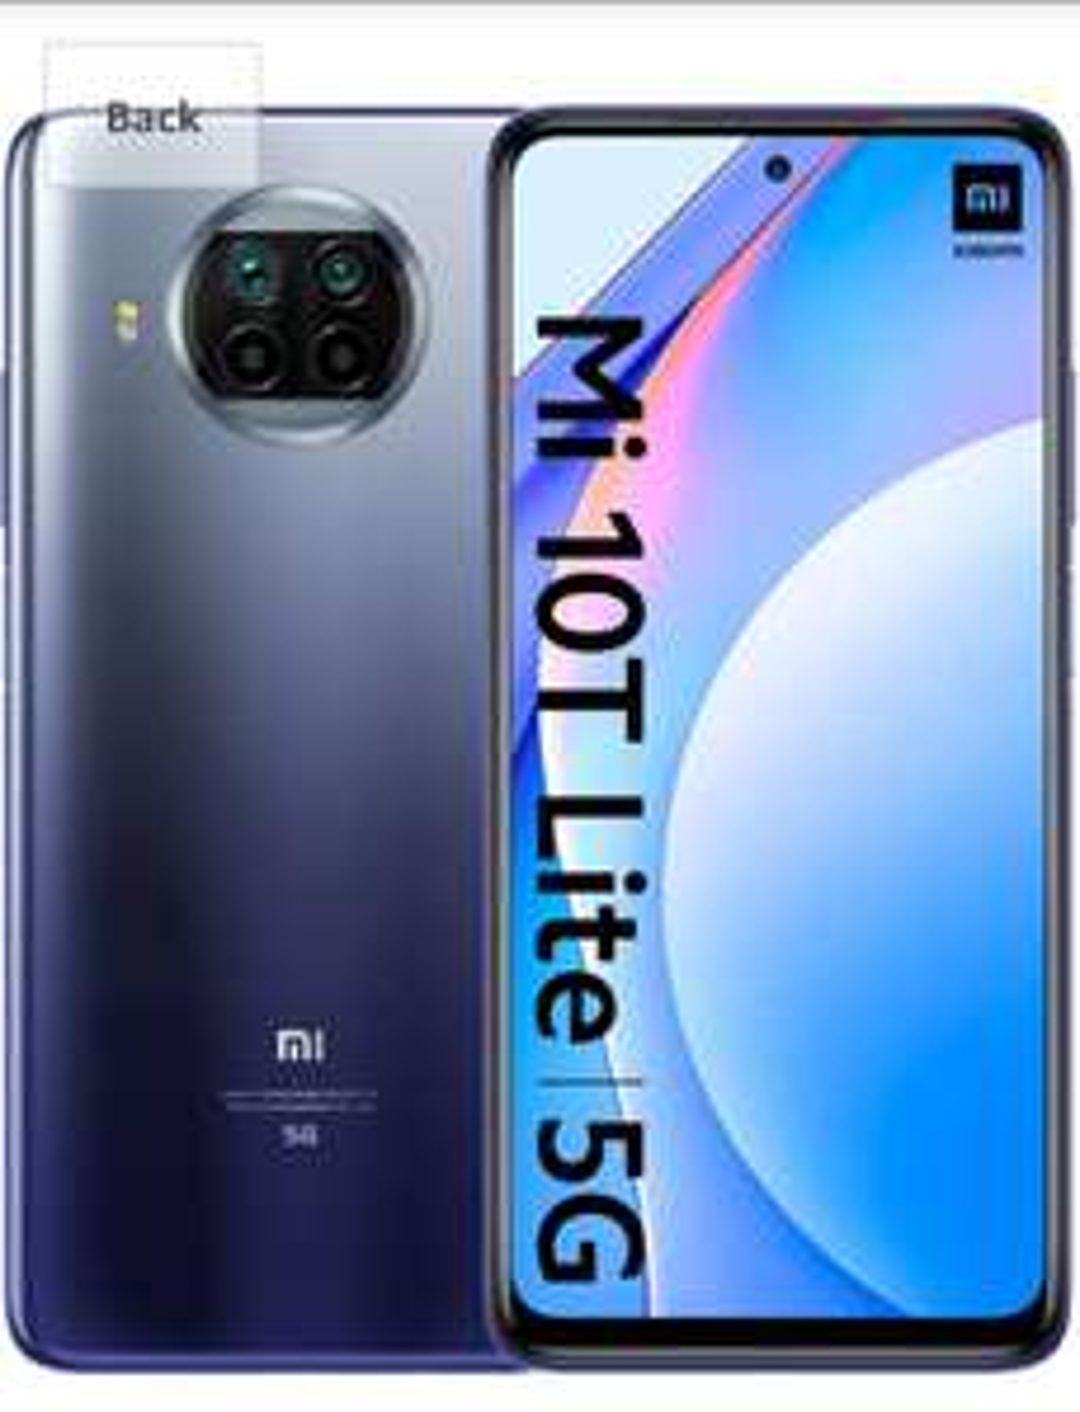 Xiaomi Mi 10T Lite 5G - Smartphone 6+64GB £229.99 @ Amazon